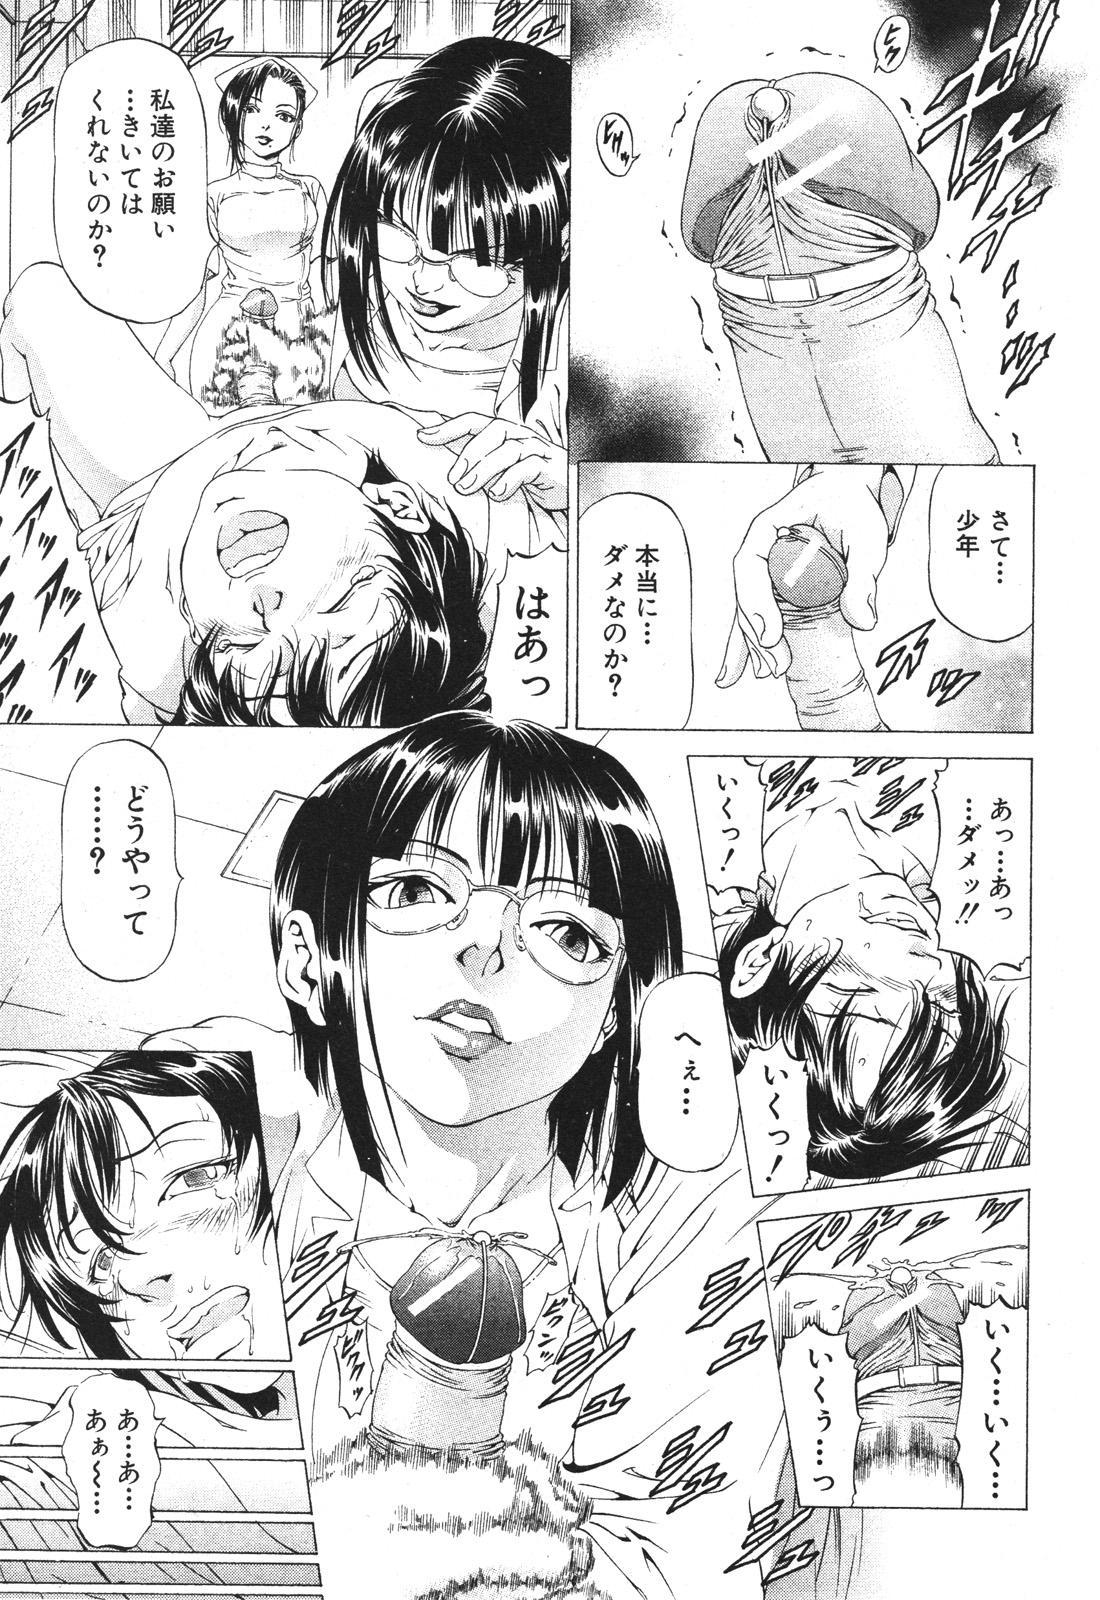 BUSTER COMIC 2010-05 Vol.07 165